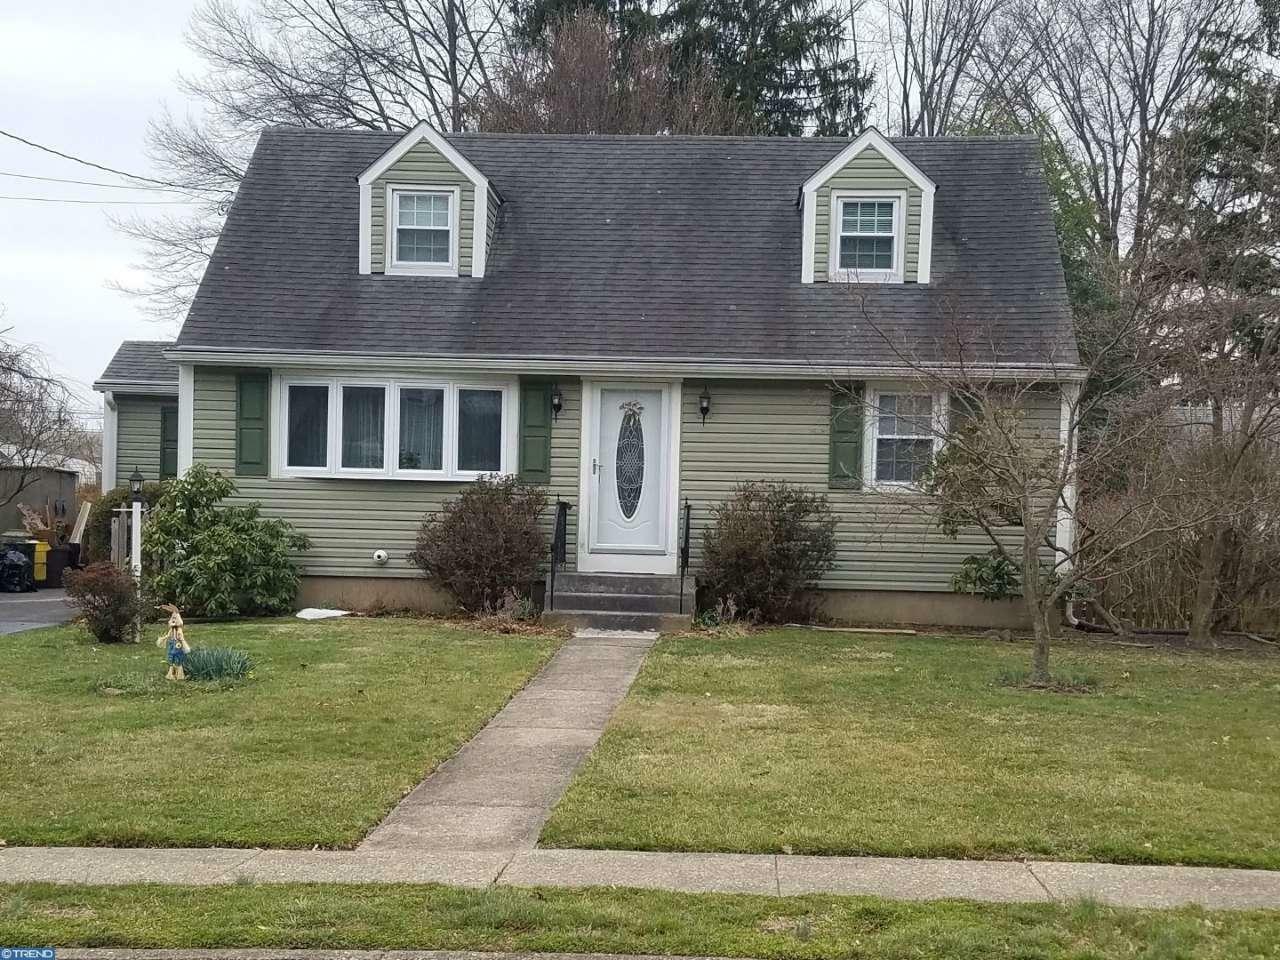 225 Nancy Ln, Ewing Twp, NJ - USA (photo 1)